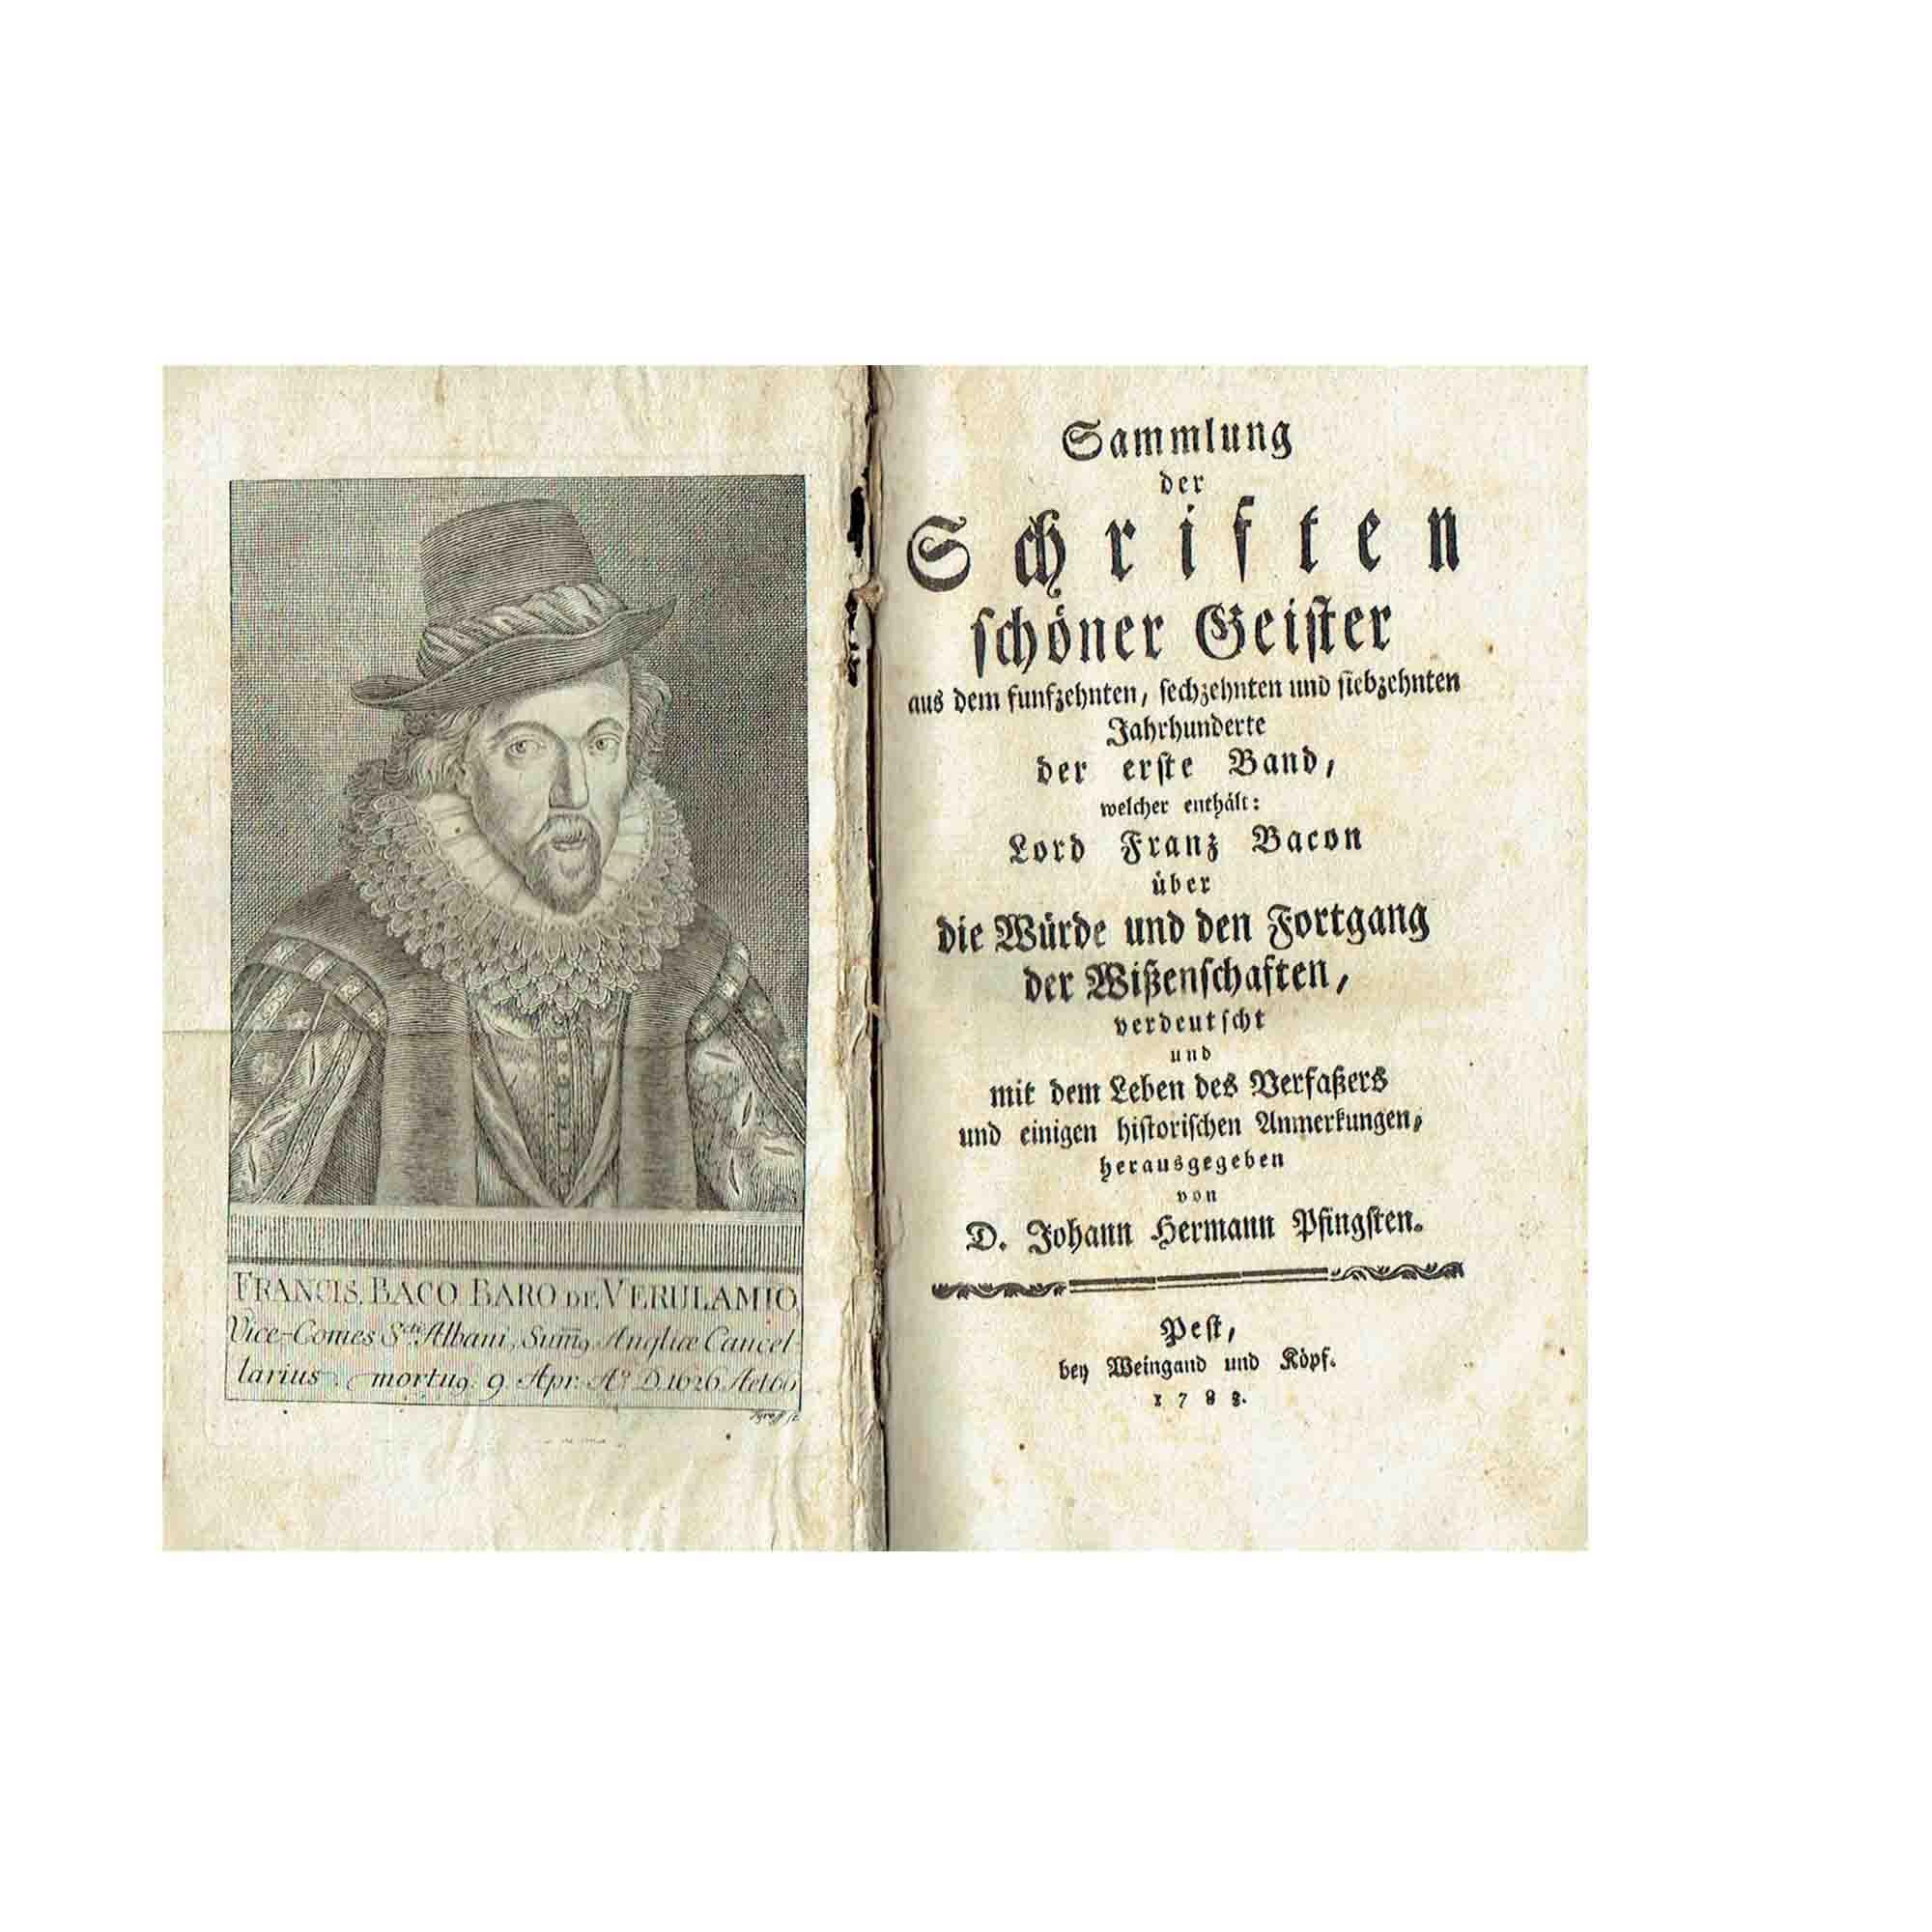 5448-Bacon-Würde-Wissenschaft-1783-Titel-Front-N.jpg